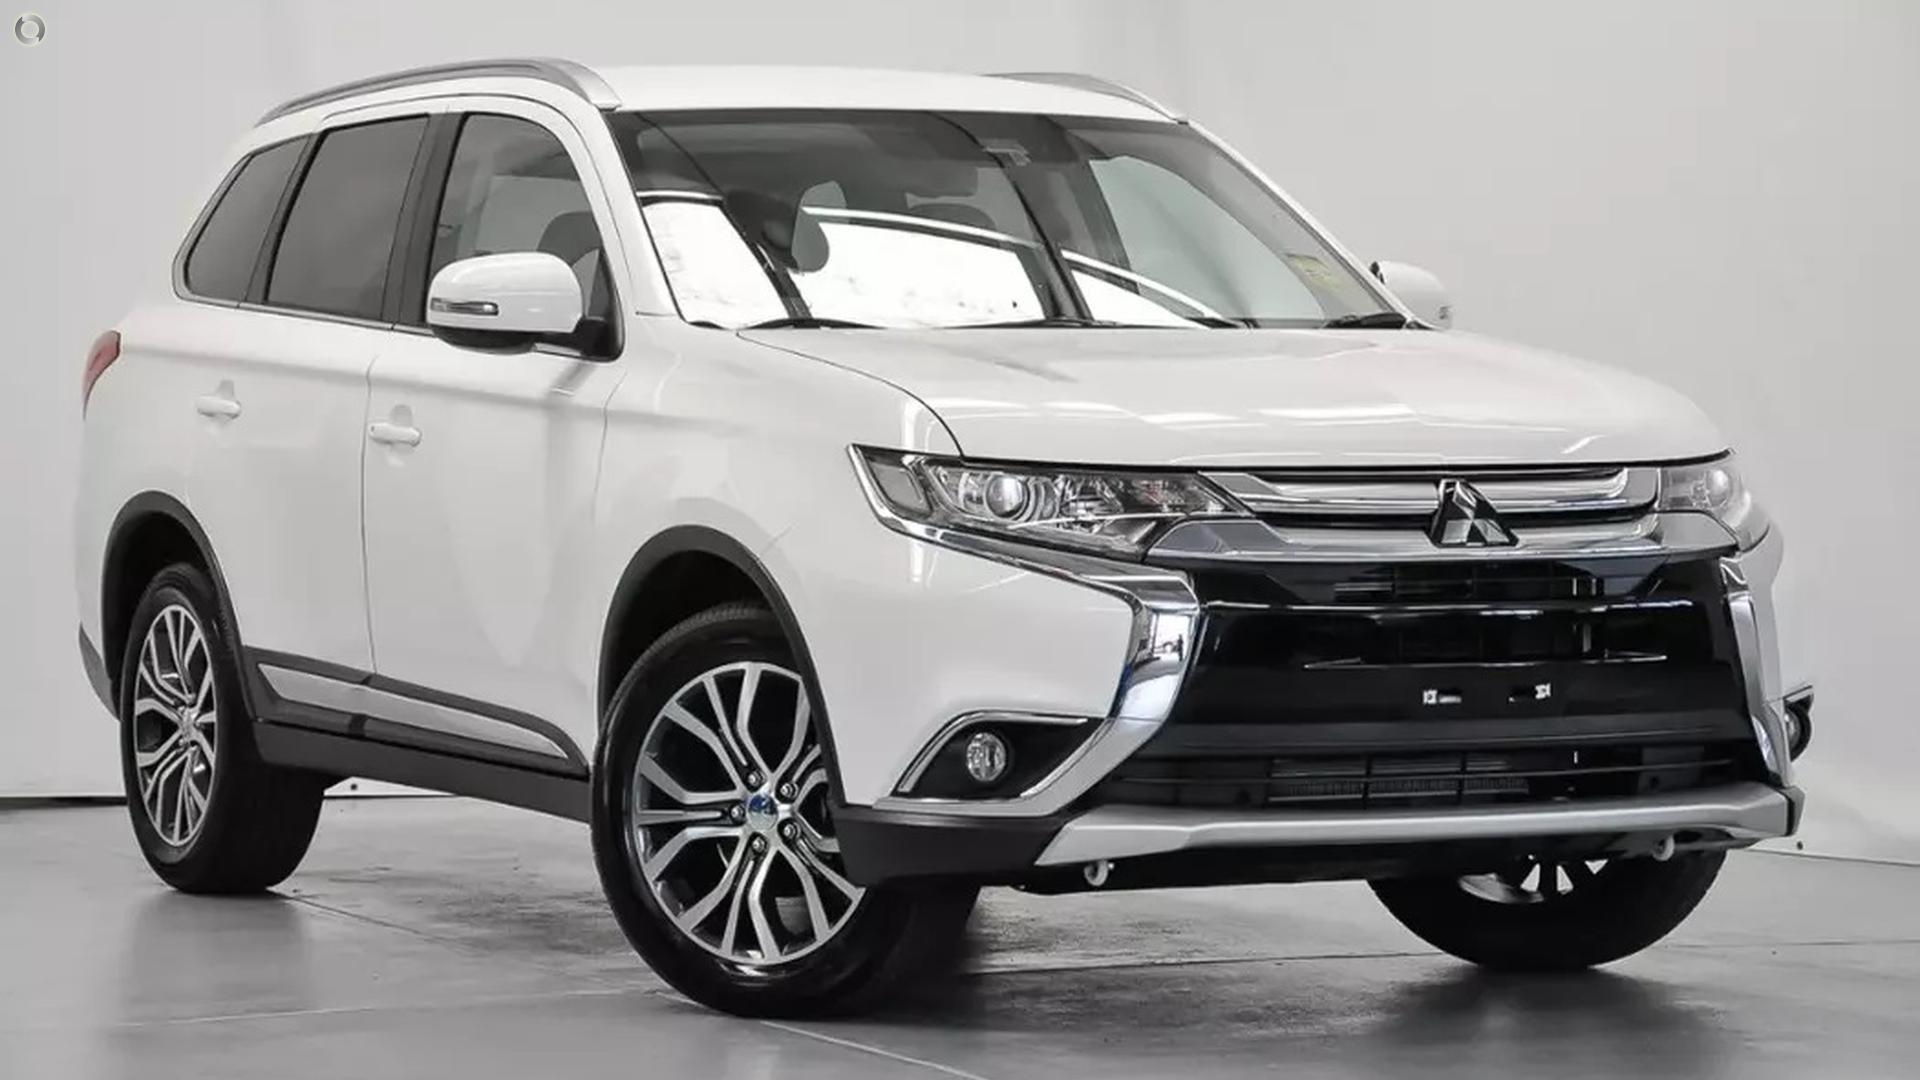 2016 Mitsubishi Outlander Ls Safety Pack